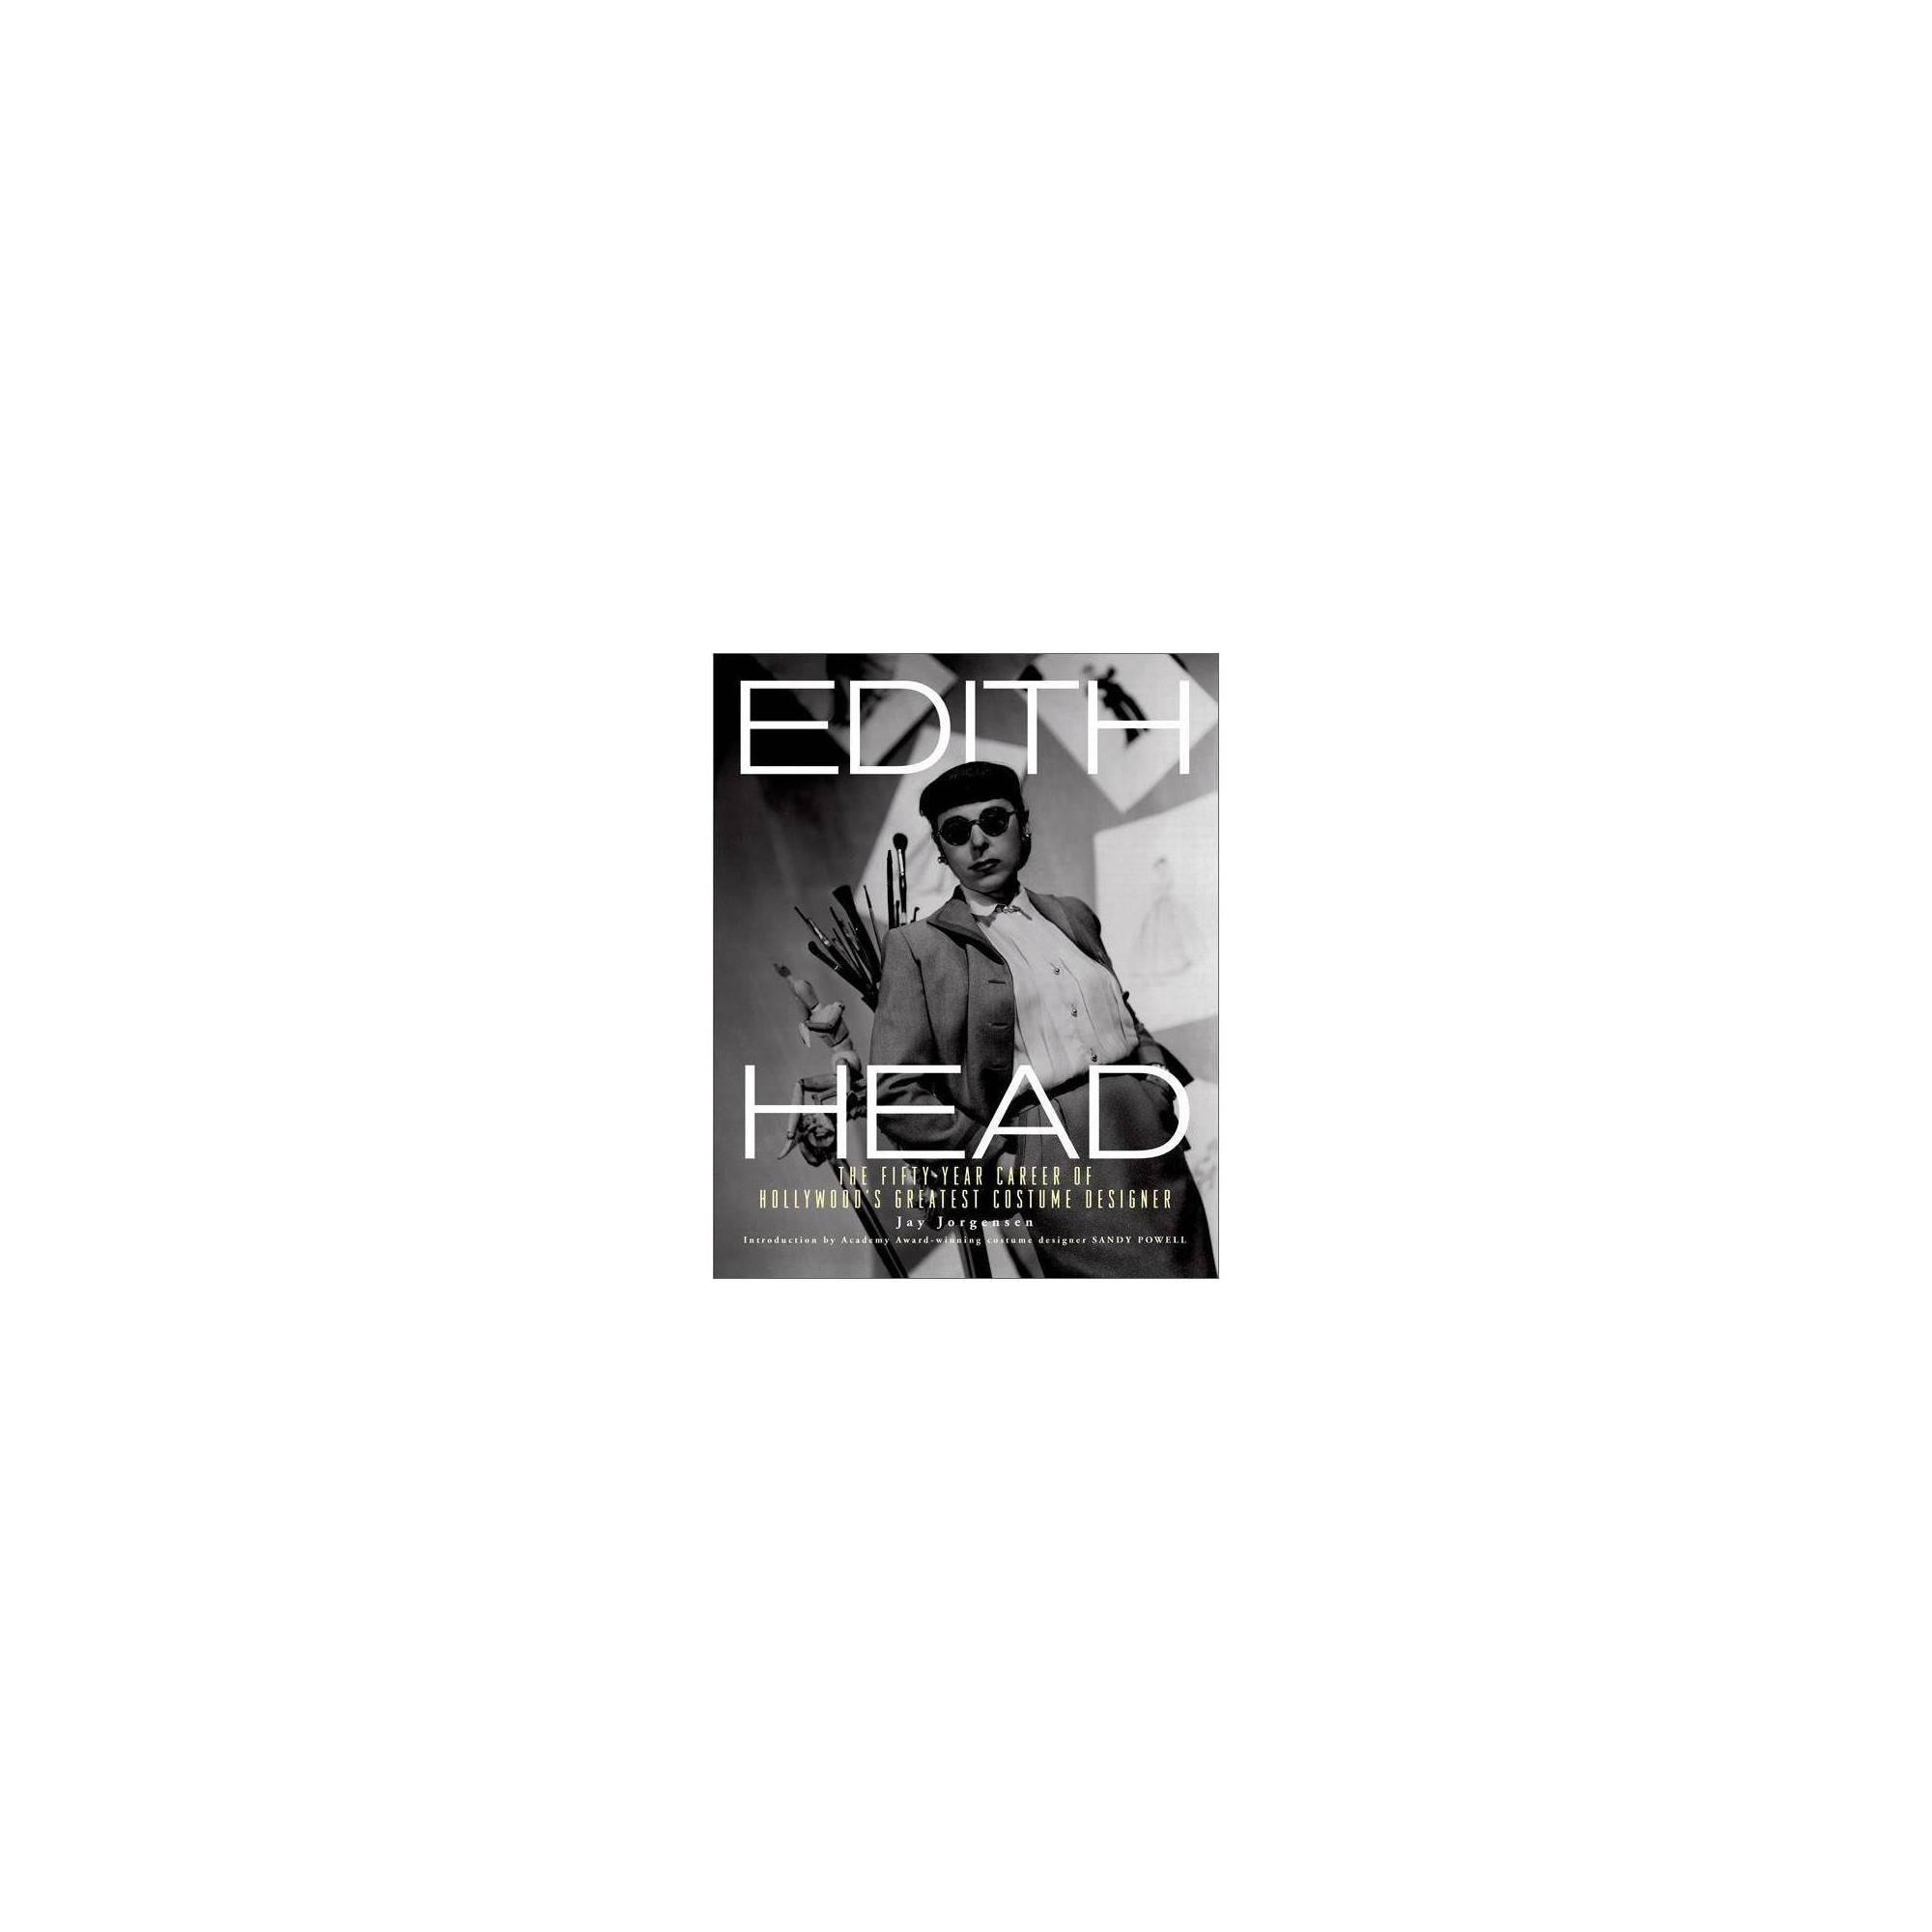 Edith Head - by Jay Jorgensen (Hardcover)